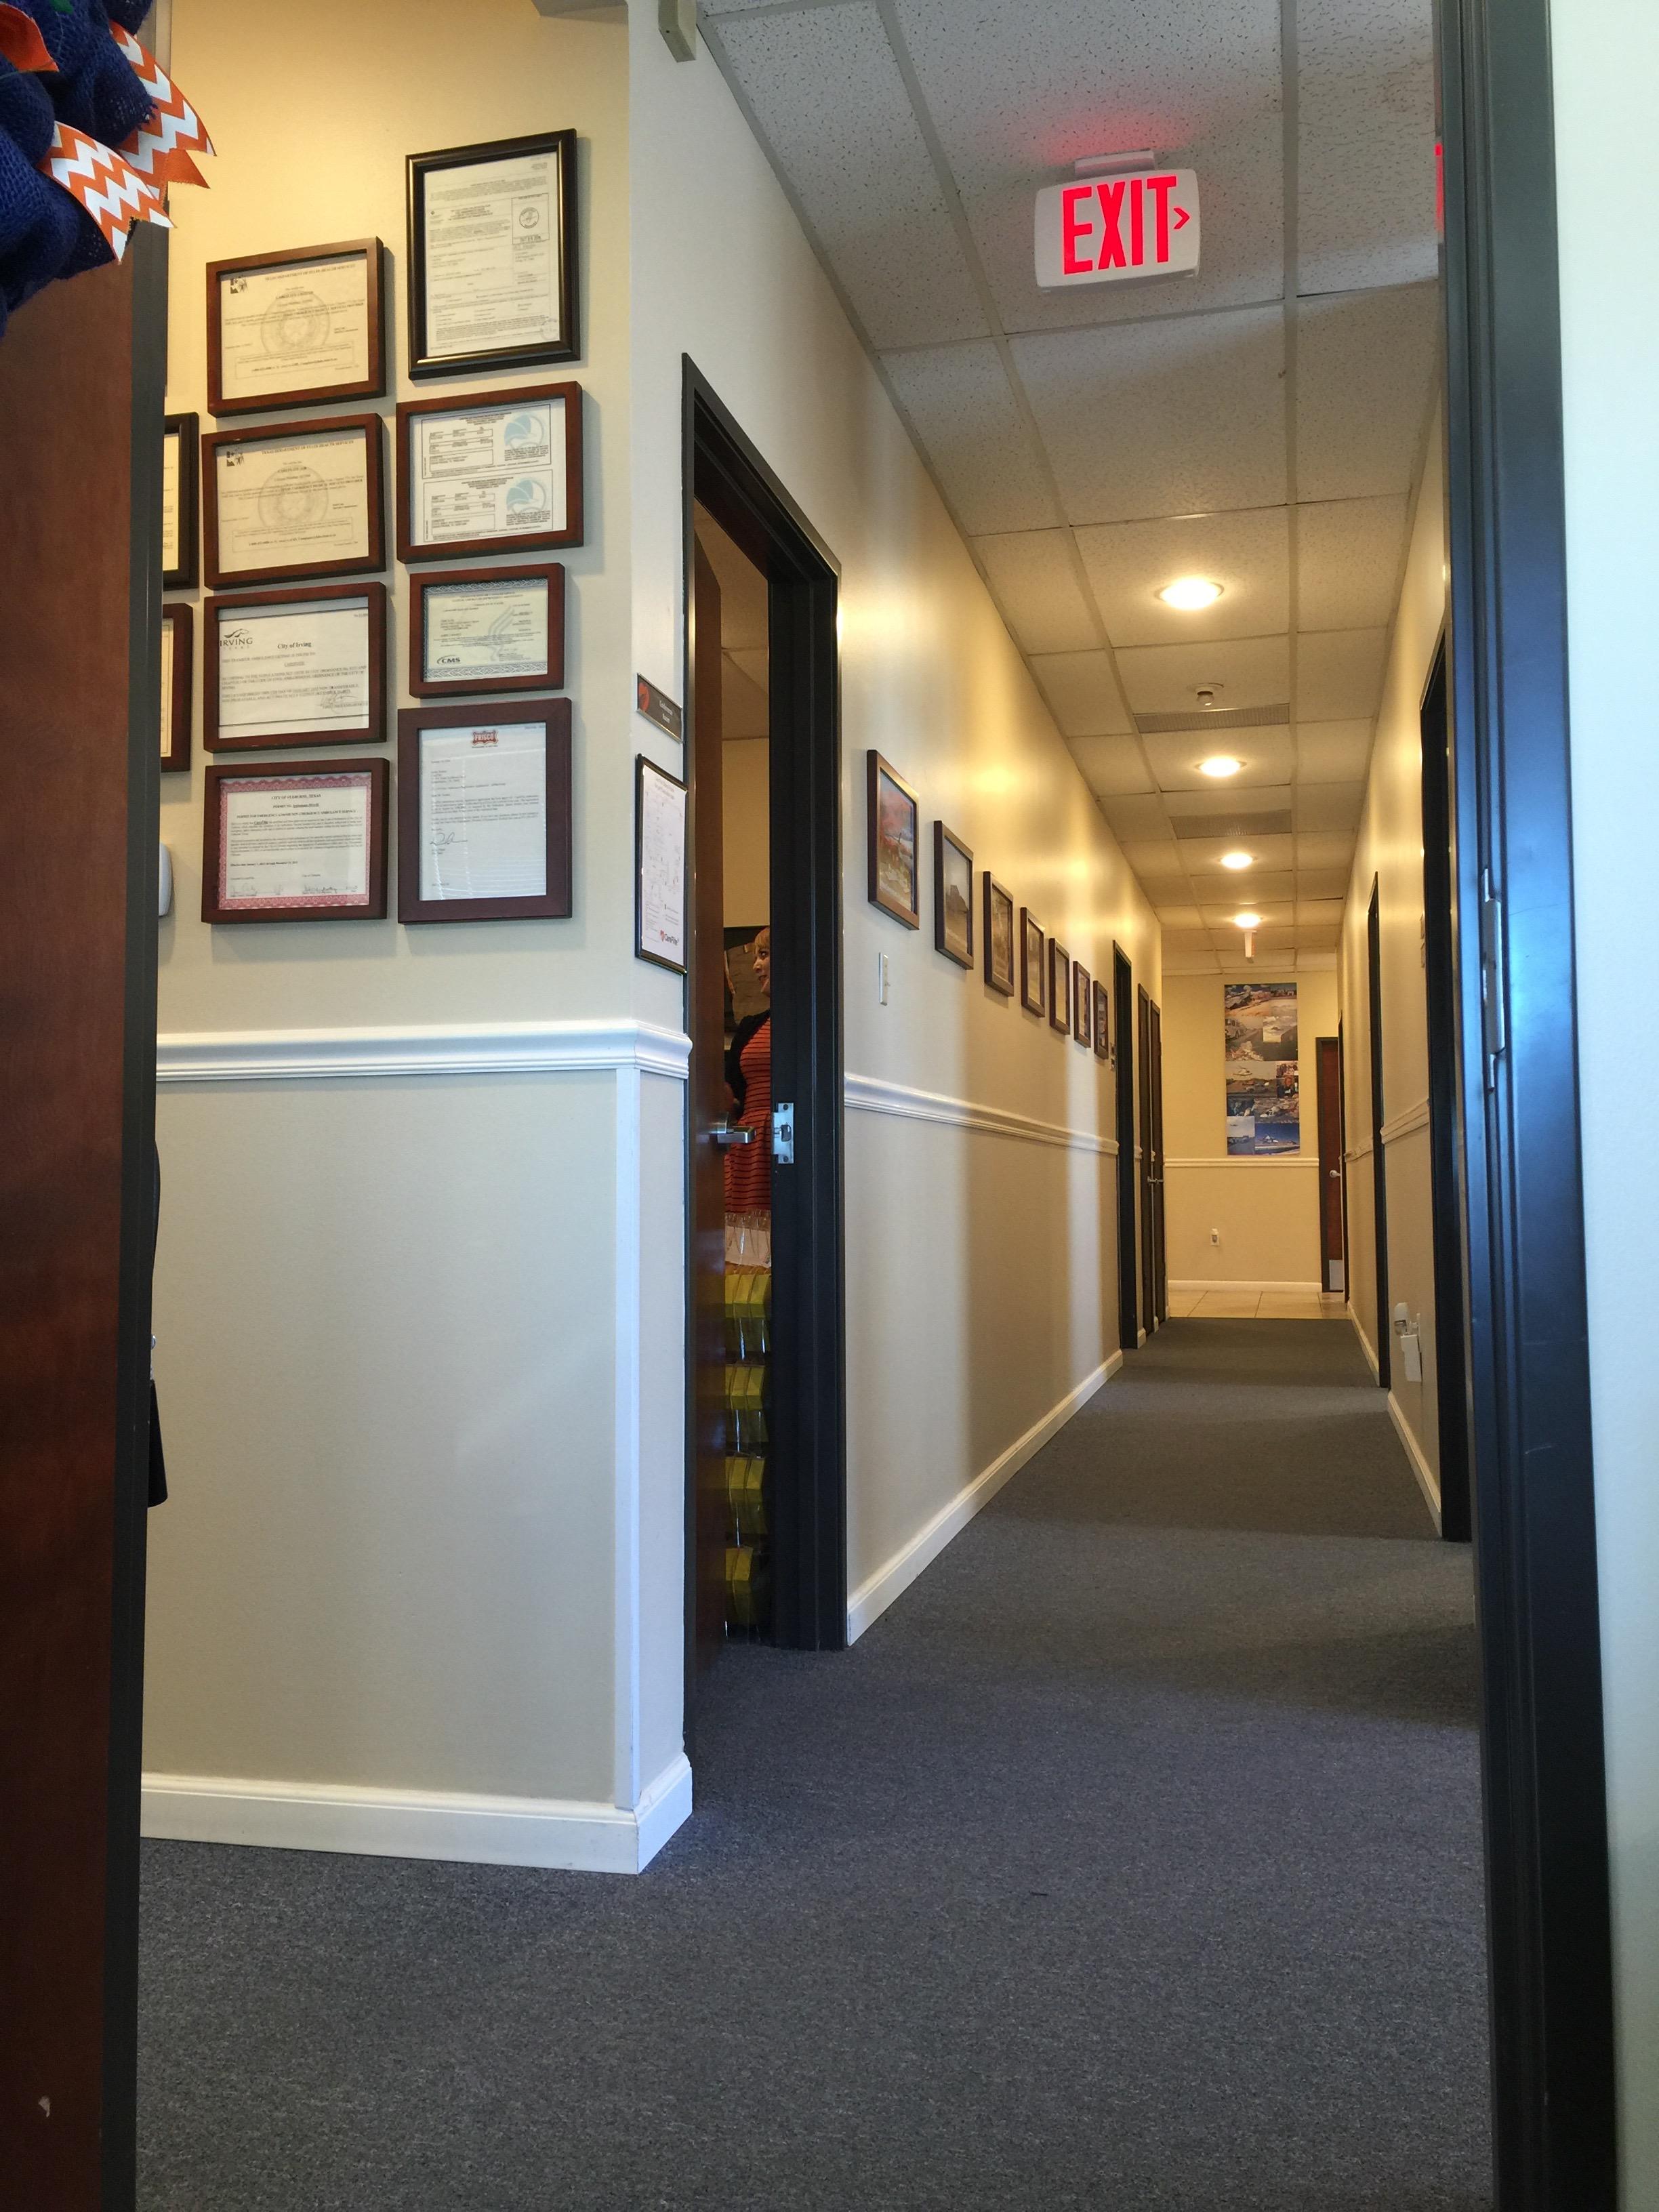 Paint, LED lights, Commercial carpet & flooring